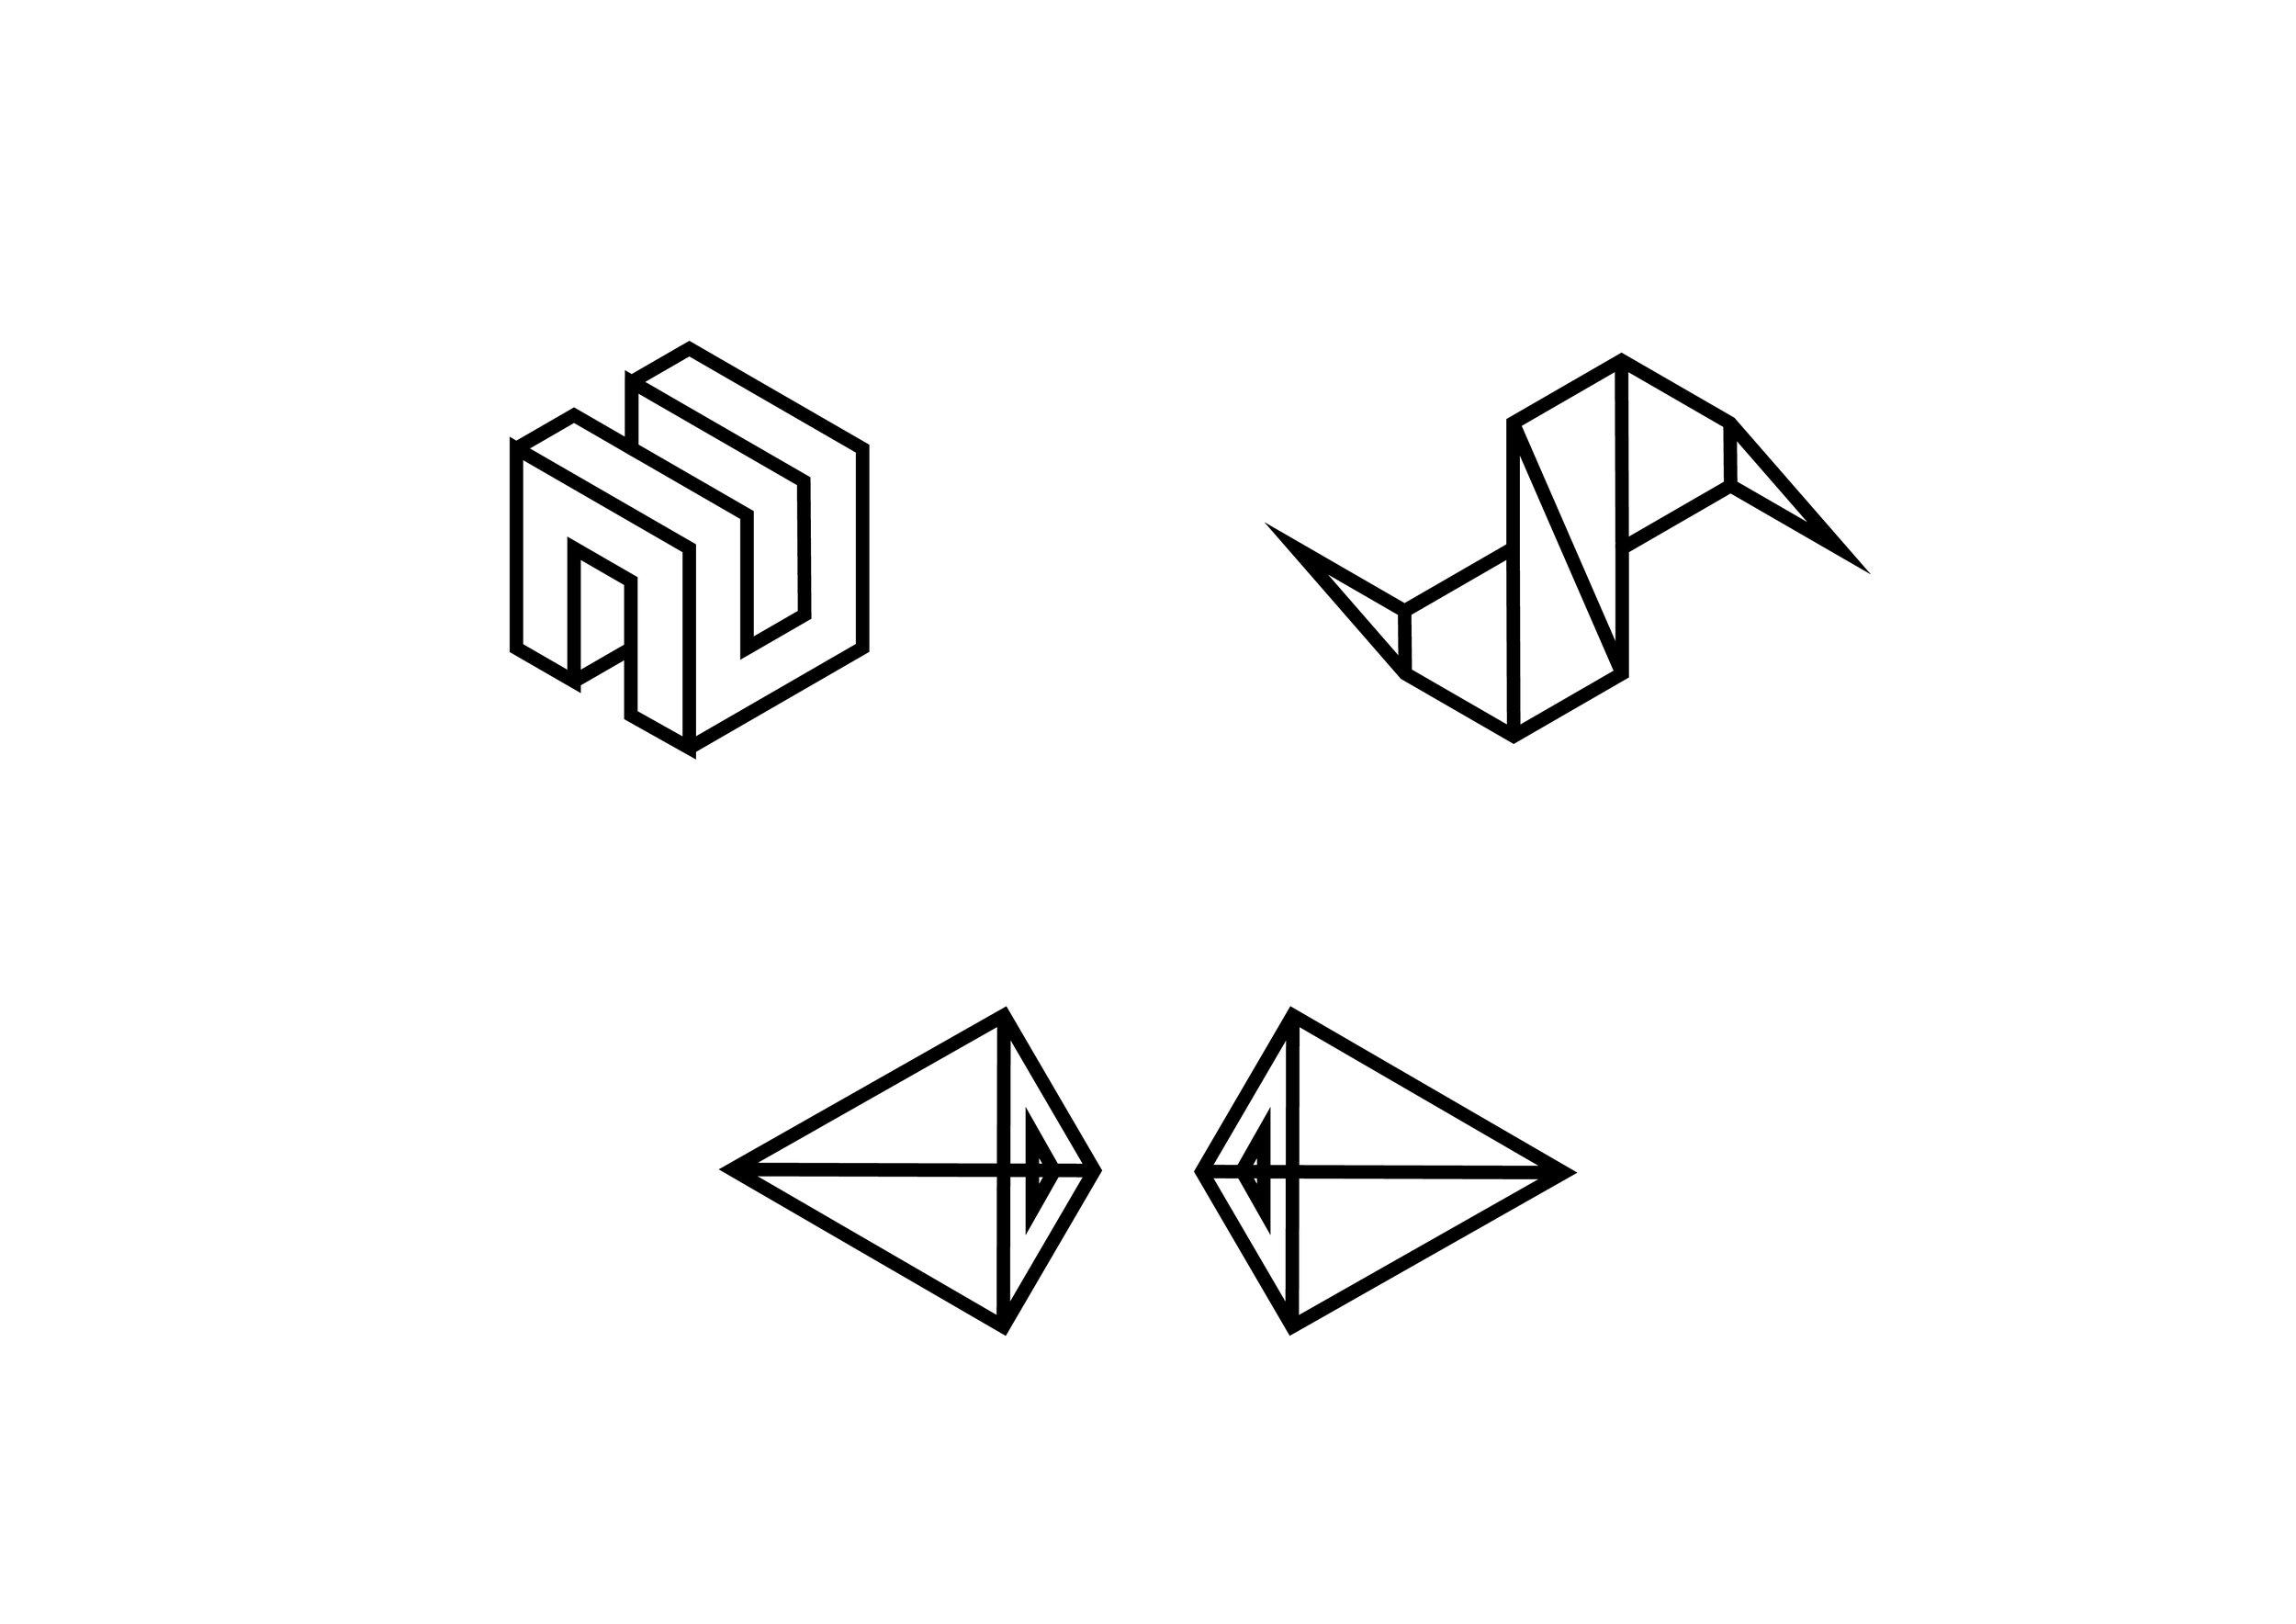 Lightbox geometry3-15.jpg